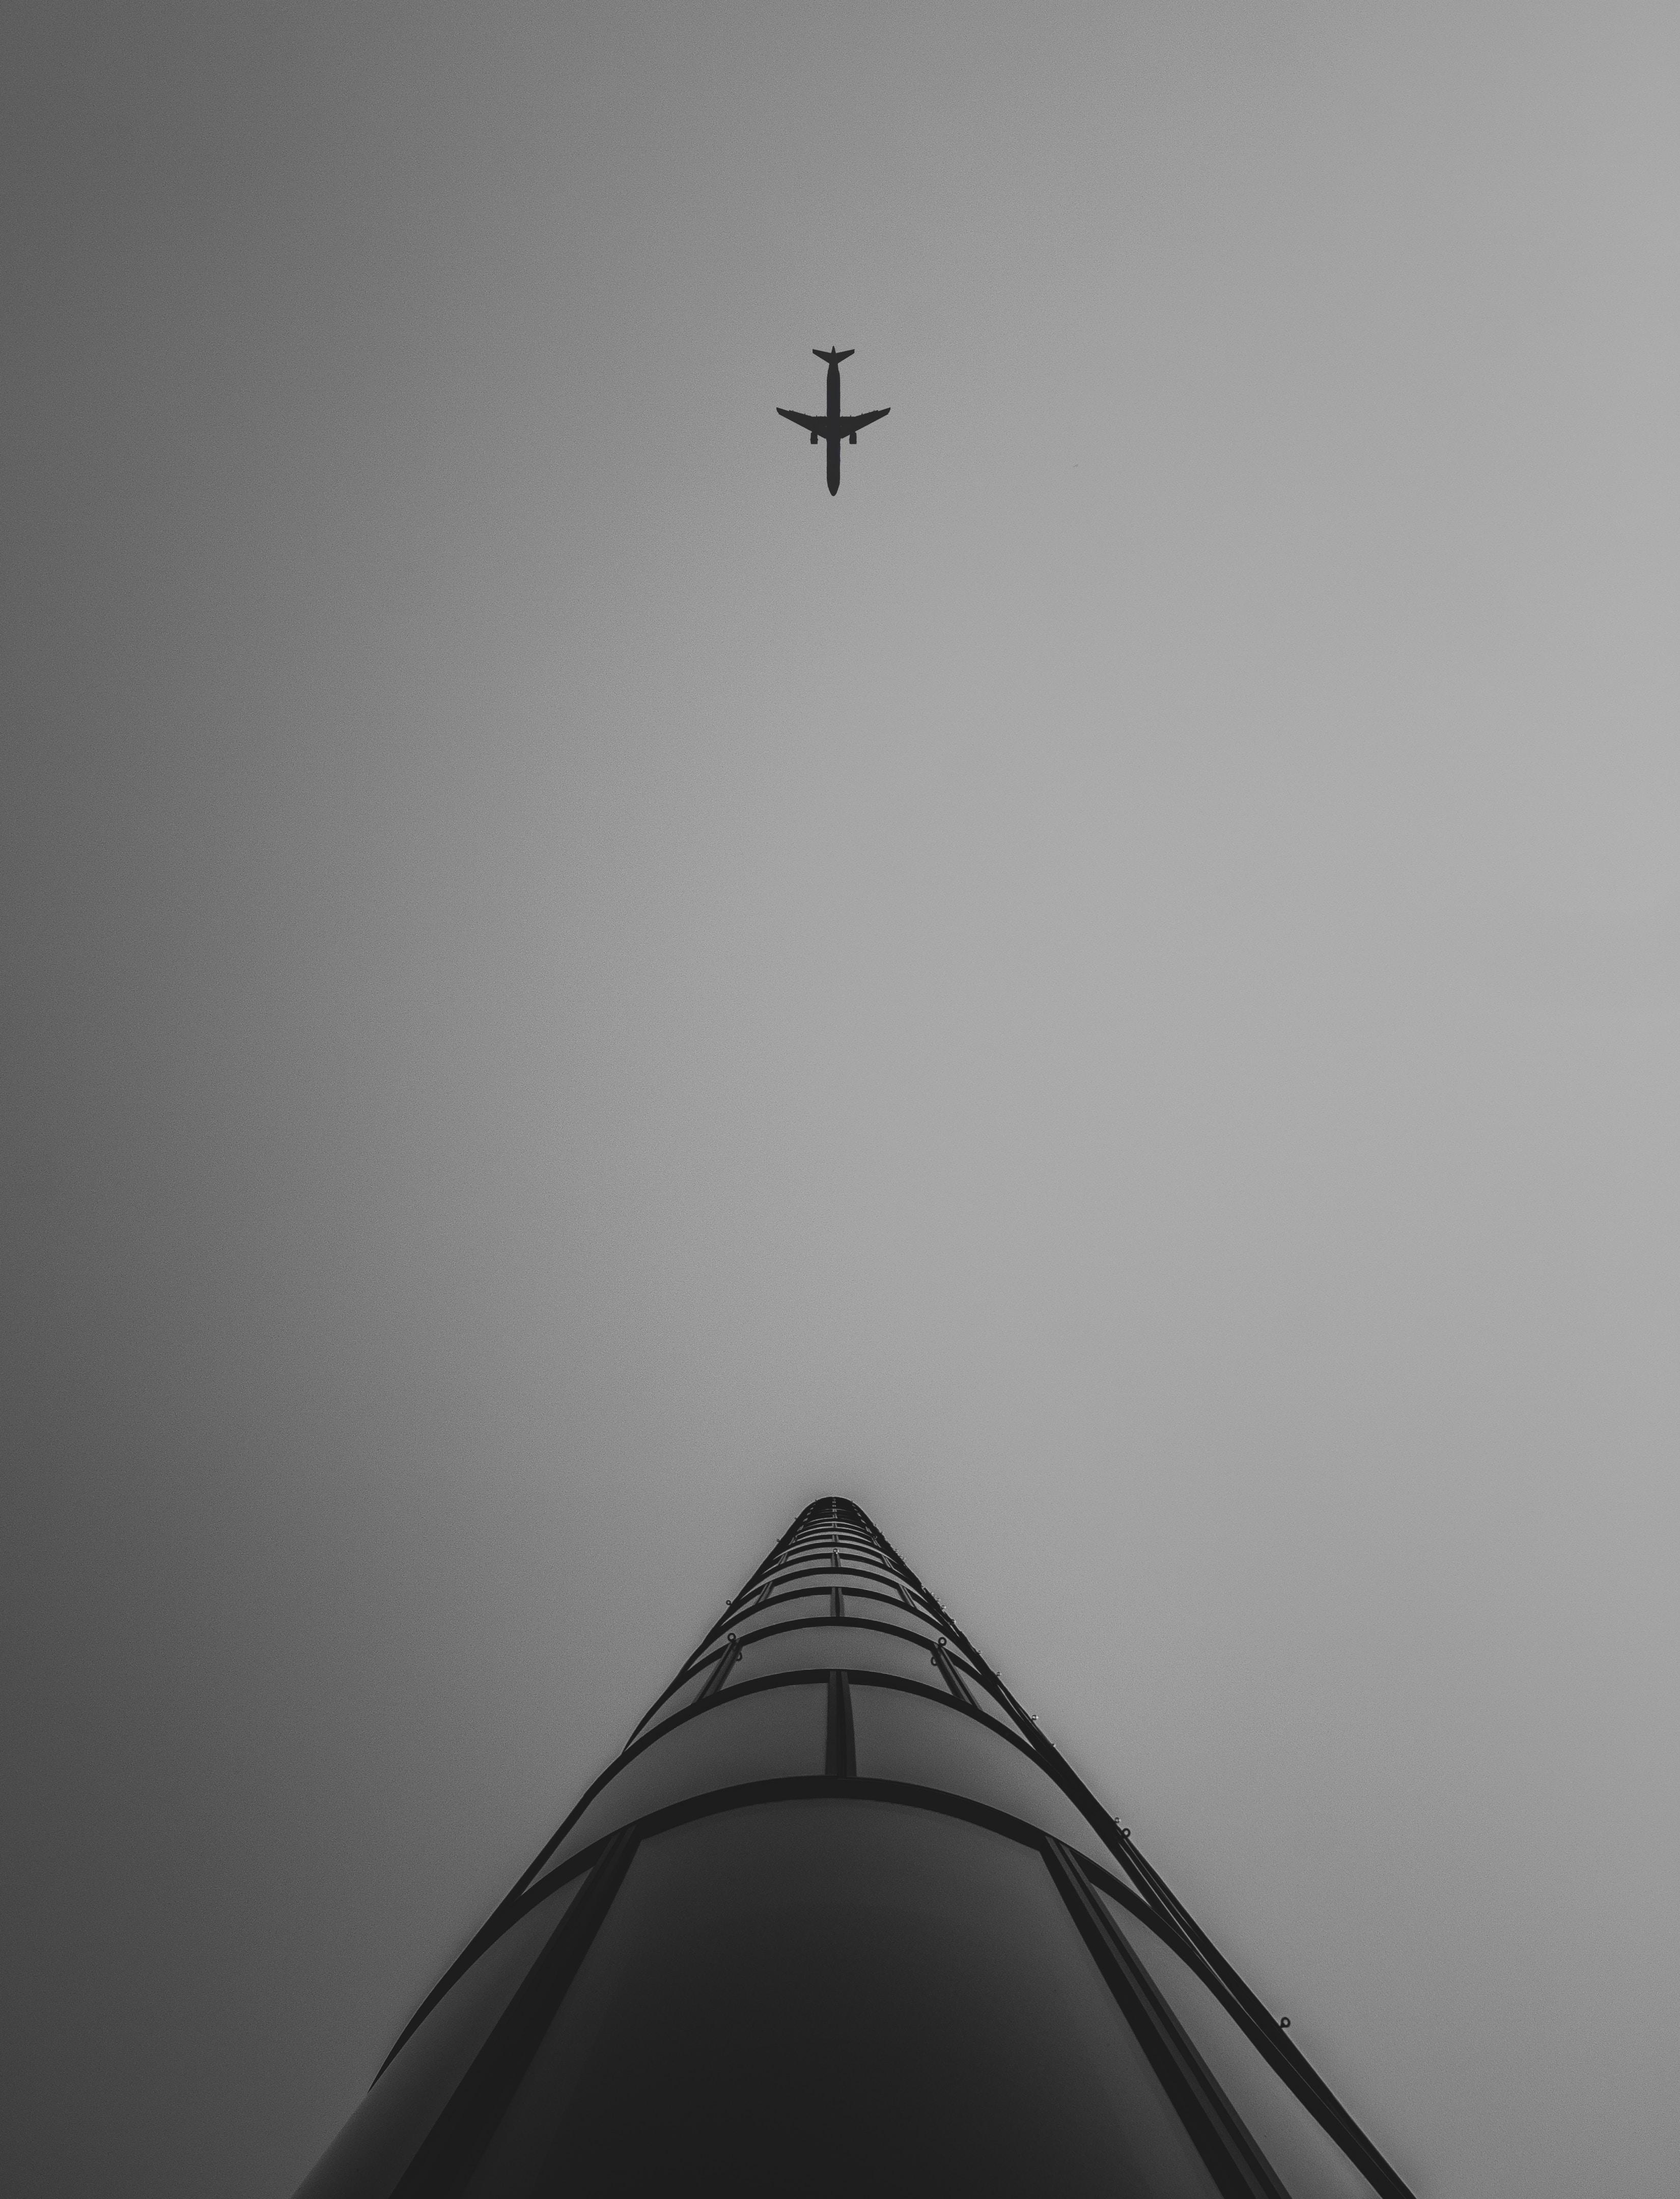 airliner in flight